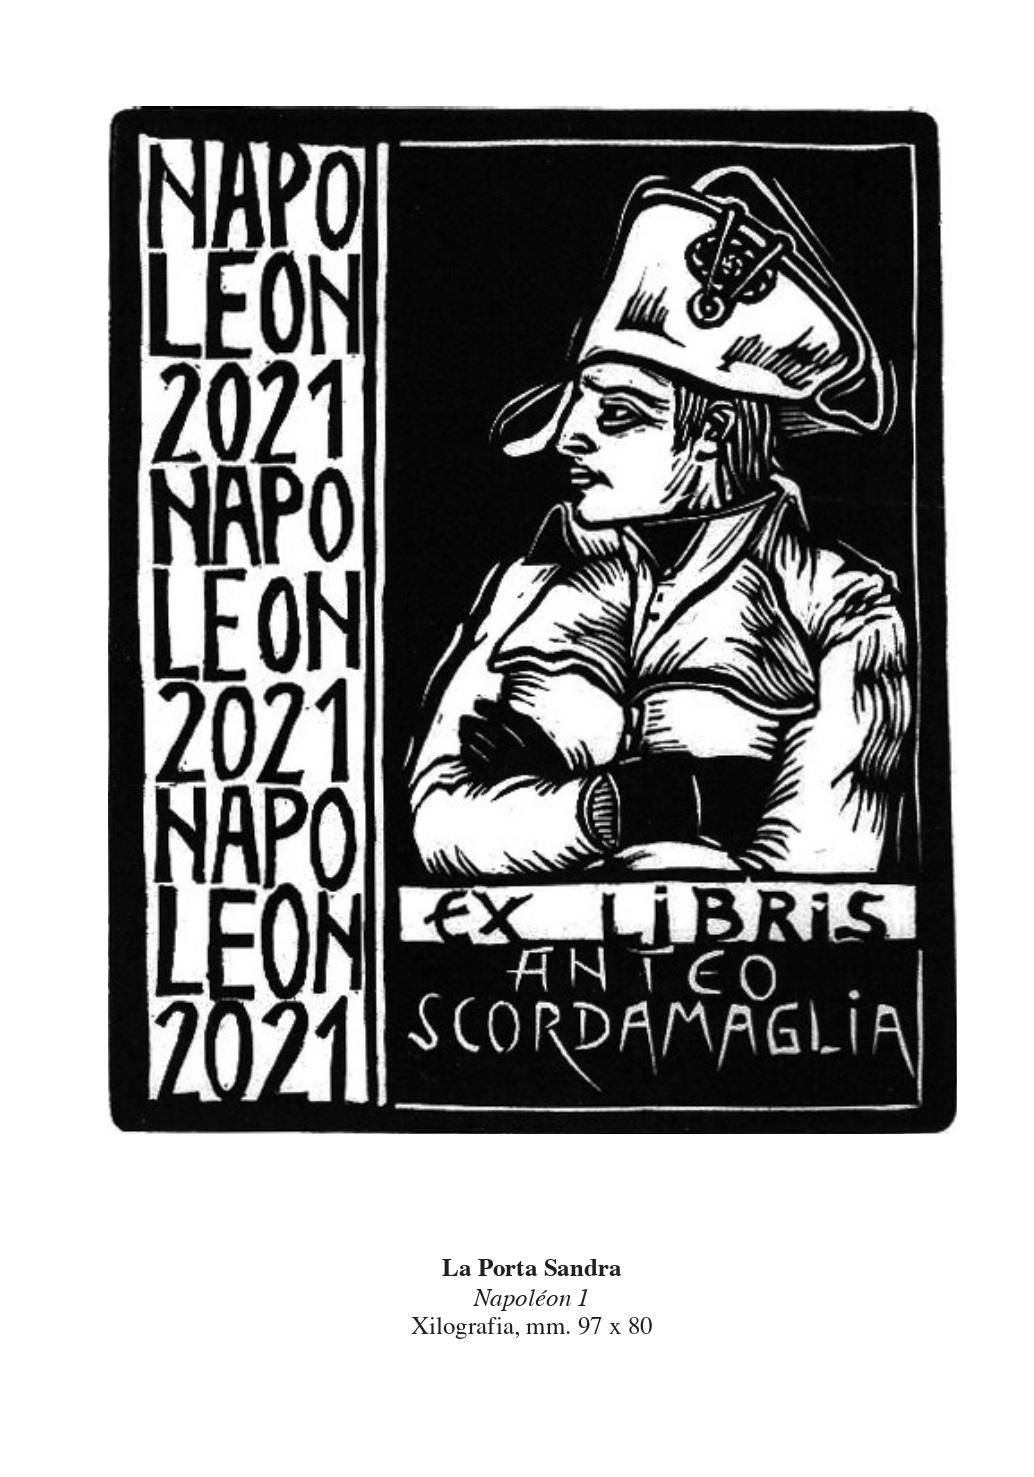 CATALOGO exlibris 2021-96_page-0001